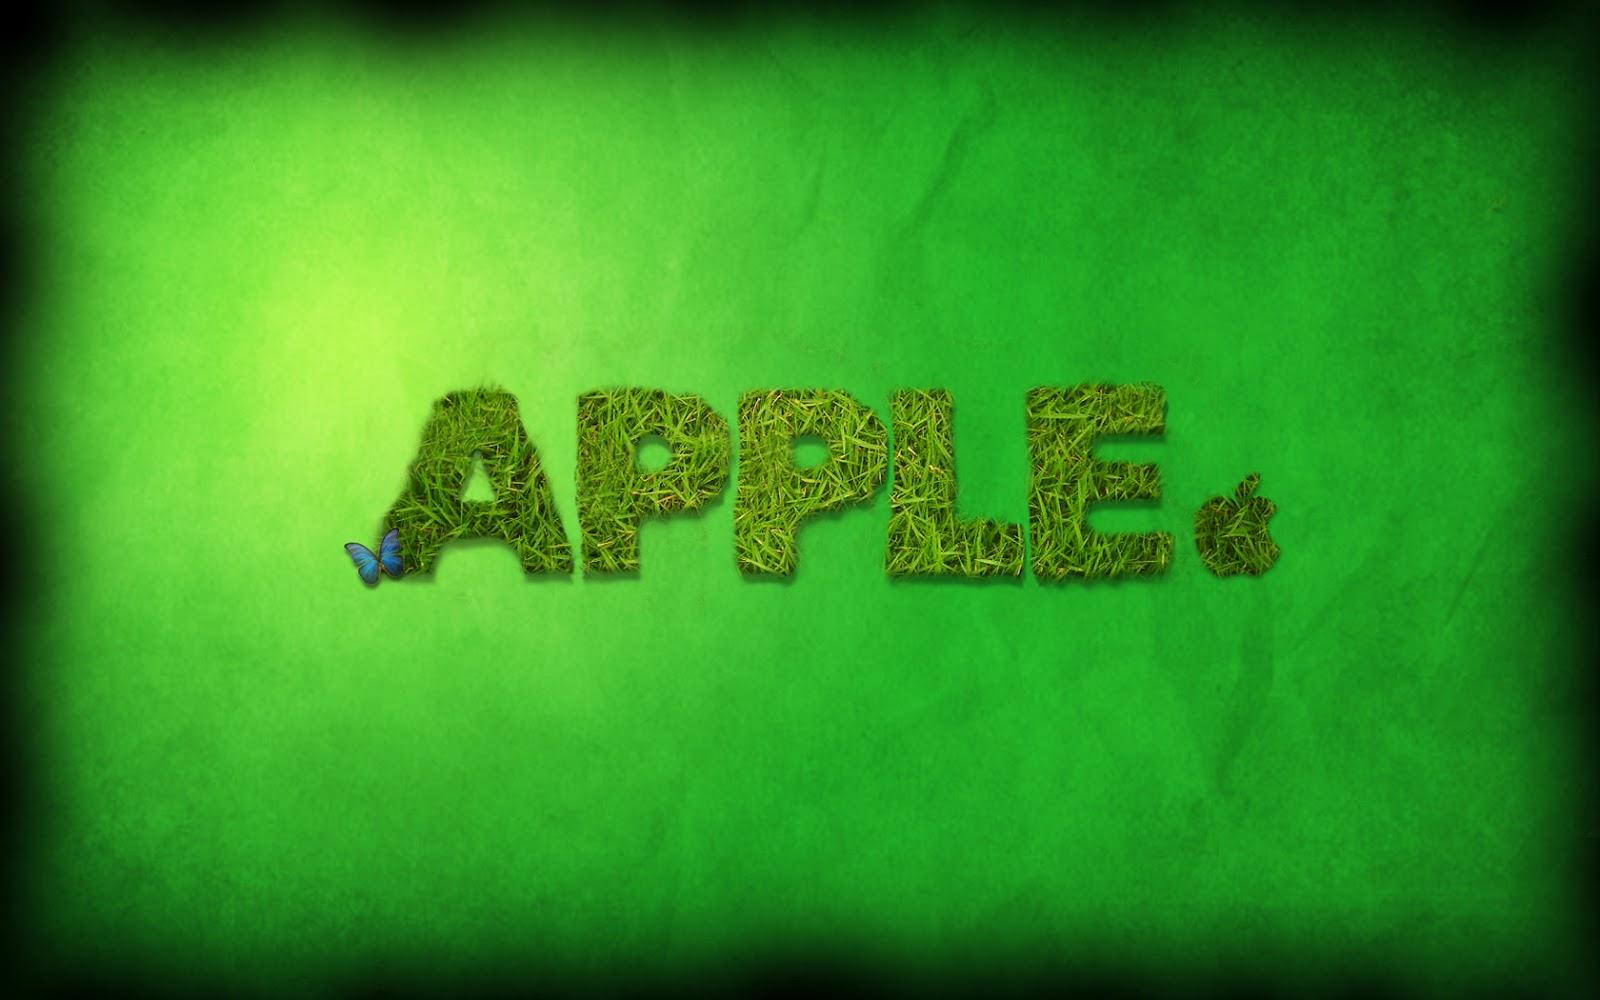 http://4.bp.blogspot.com/-wLsyzJaxNhM/T-aAJgfCV5I/AAAAAAAAALg/resOfKMSUqM/s1600/iphone+_Apple_Mac_OS_X_The_Best_HD_wallpapers_background+030.jpg